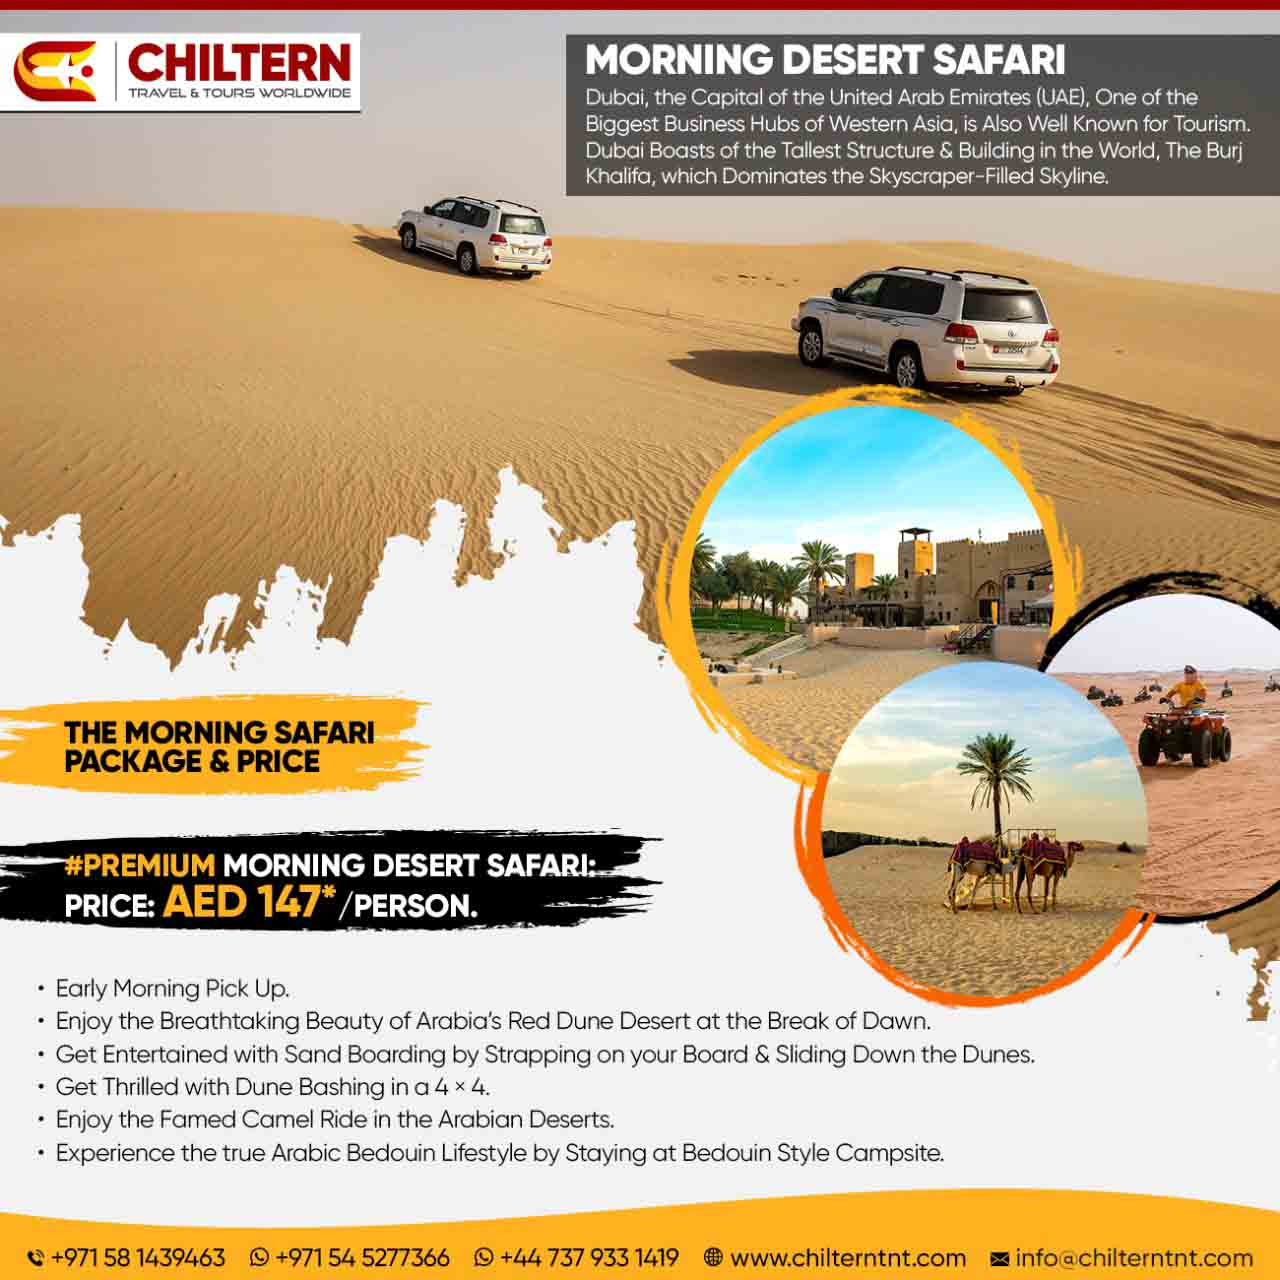 Premium Morning Desert Safari